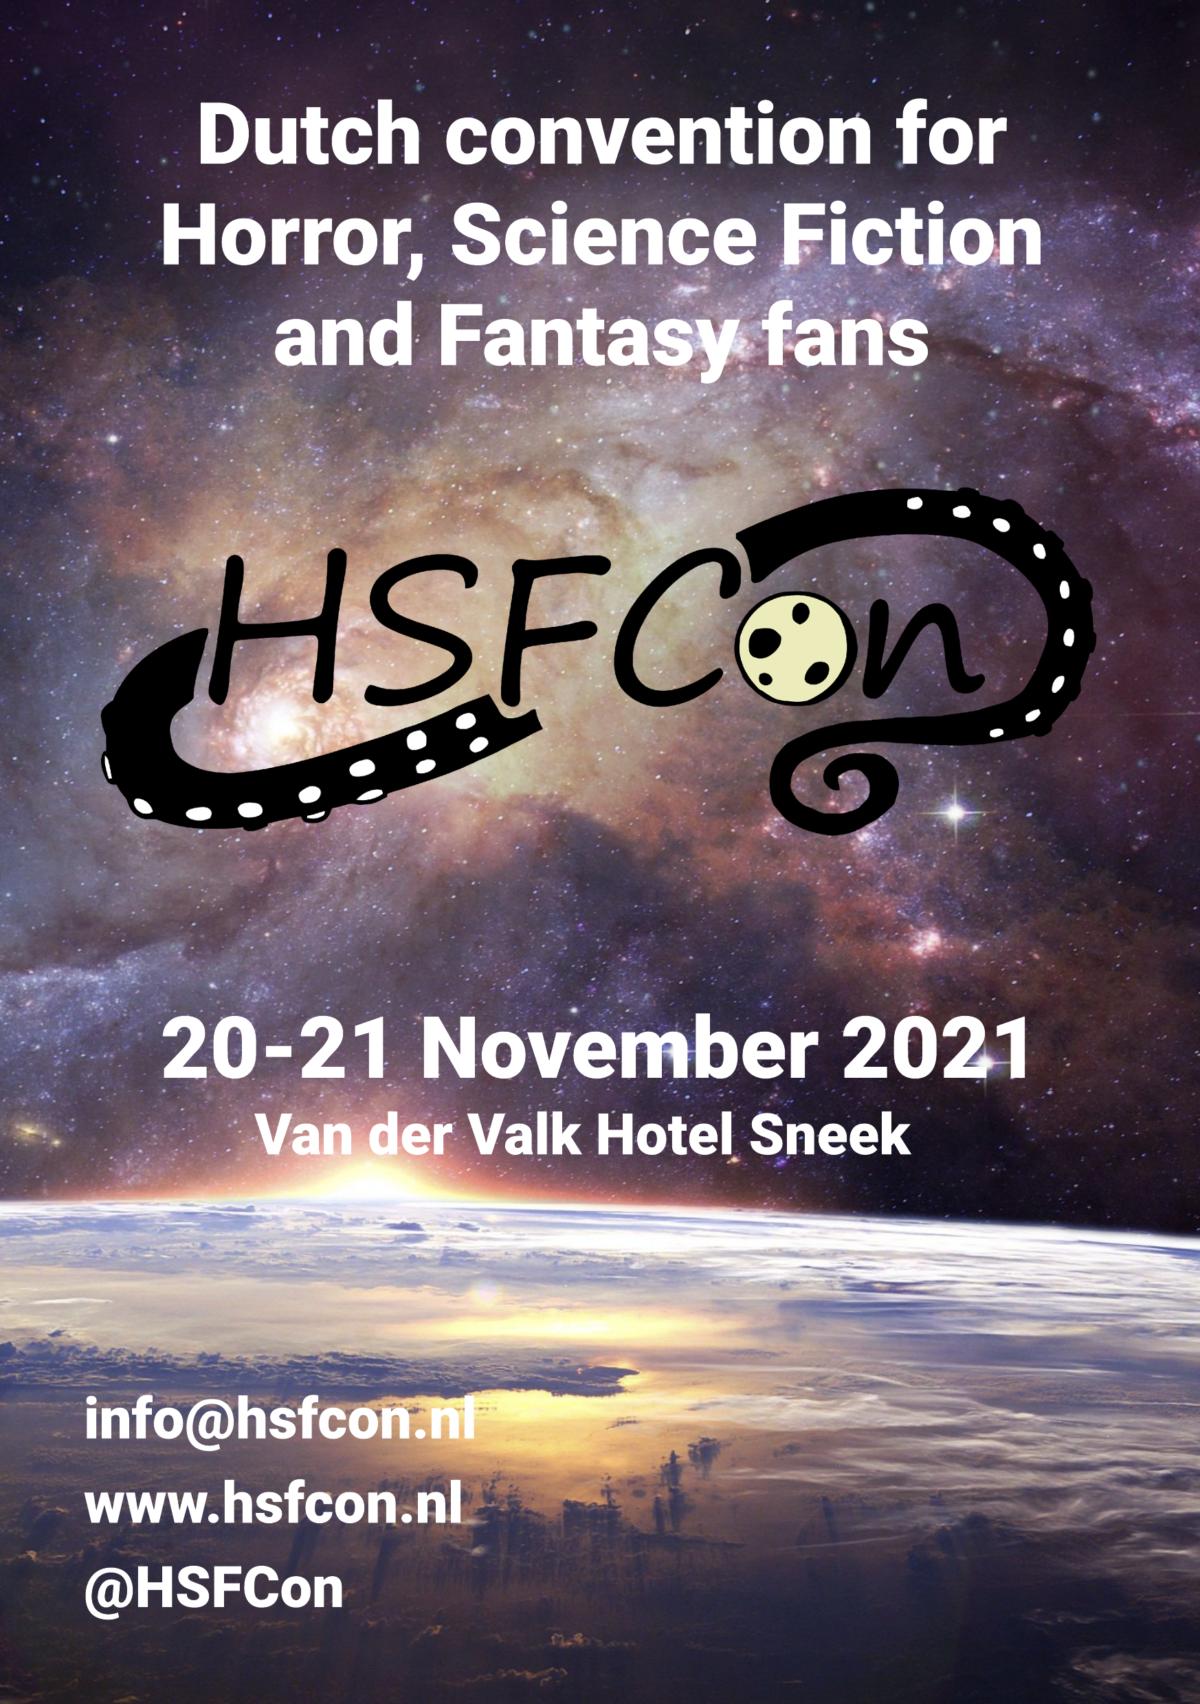 HSFCon 2021